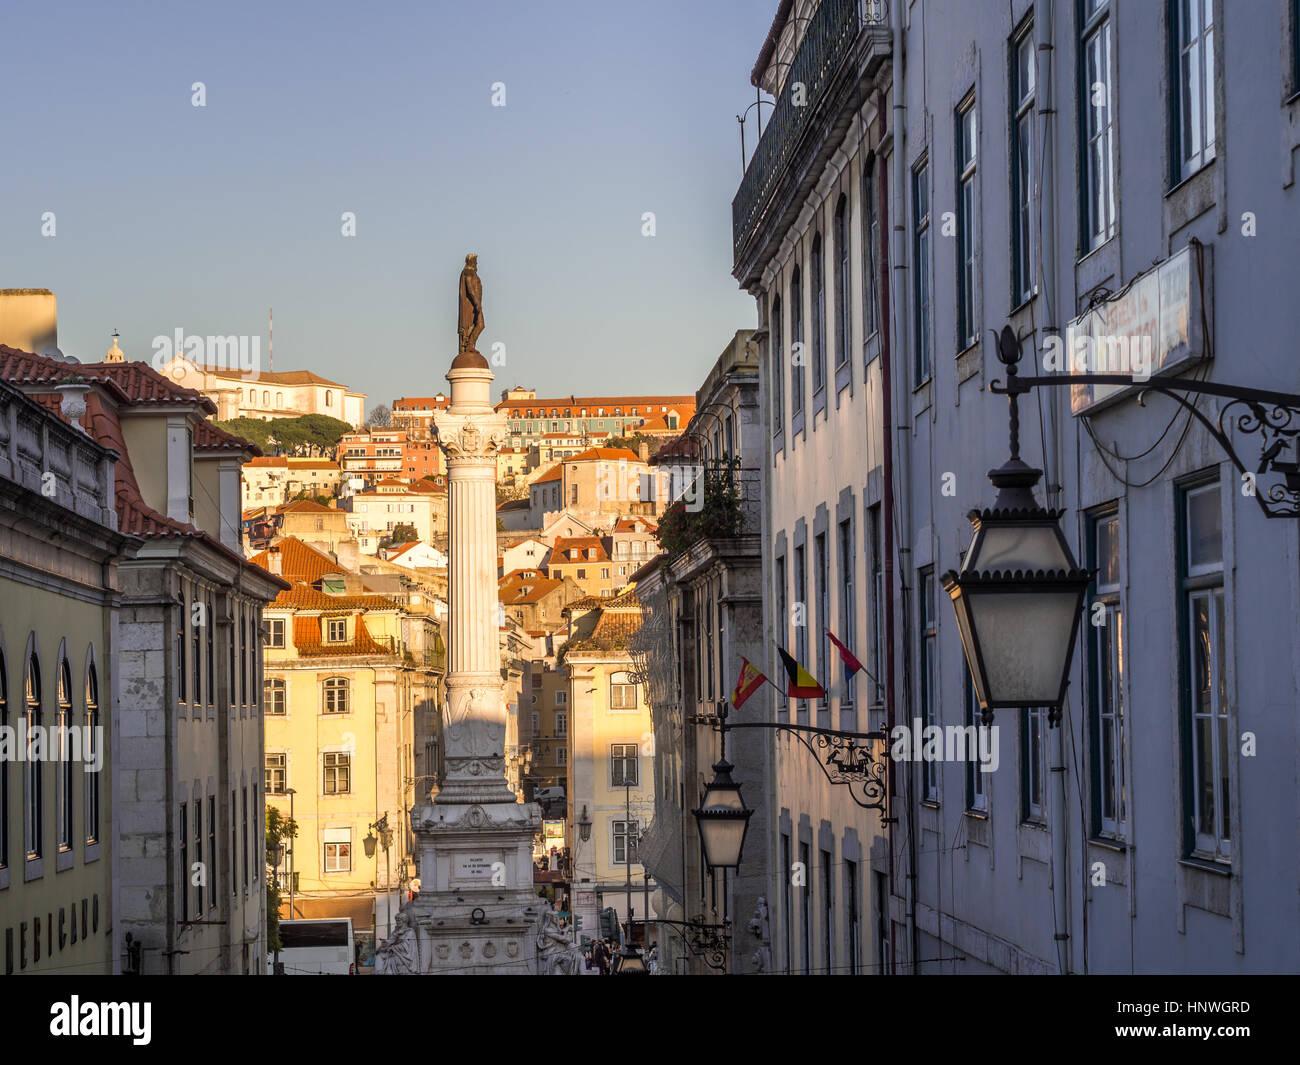 Lisboa, Portugal - 10 de enero de 2017: Columna de Pedro IV en el Rossio Square (Plaza de Pedro IV), celebrada en Imagen De Stock